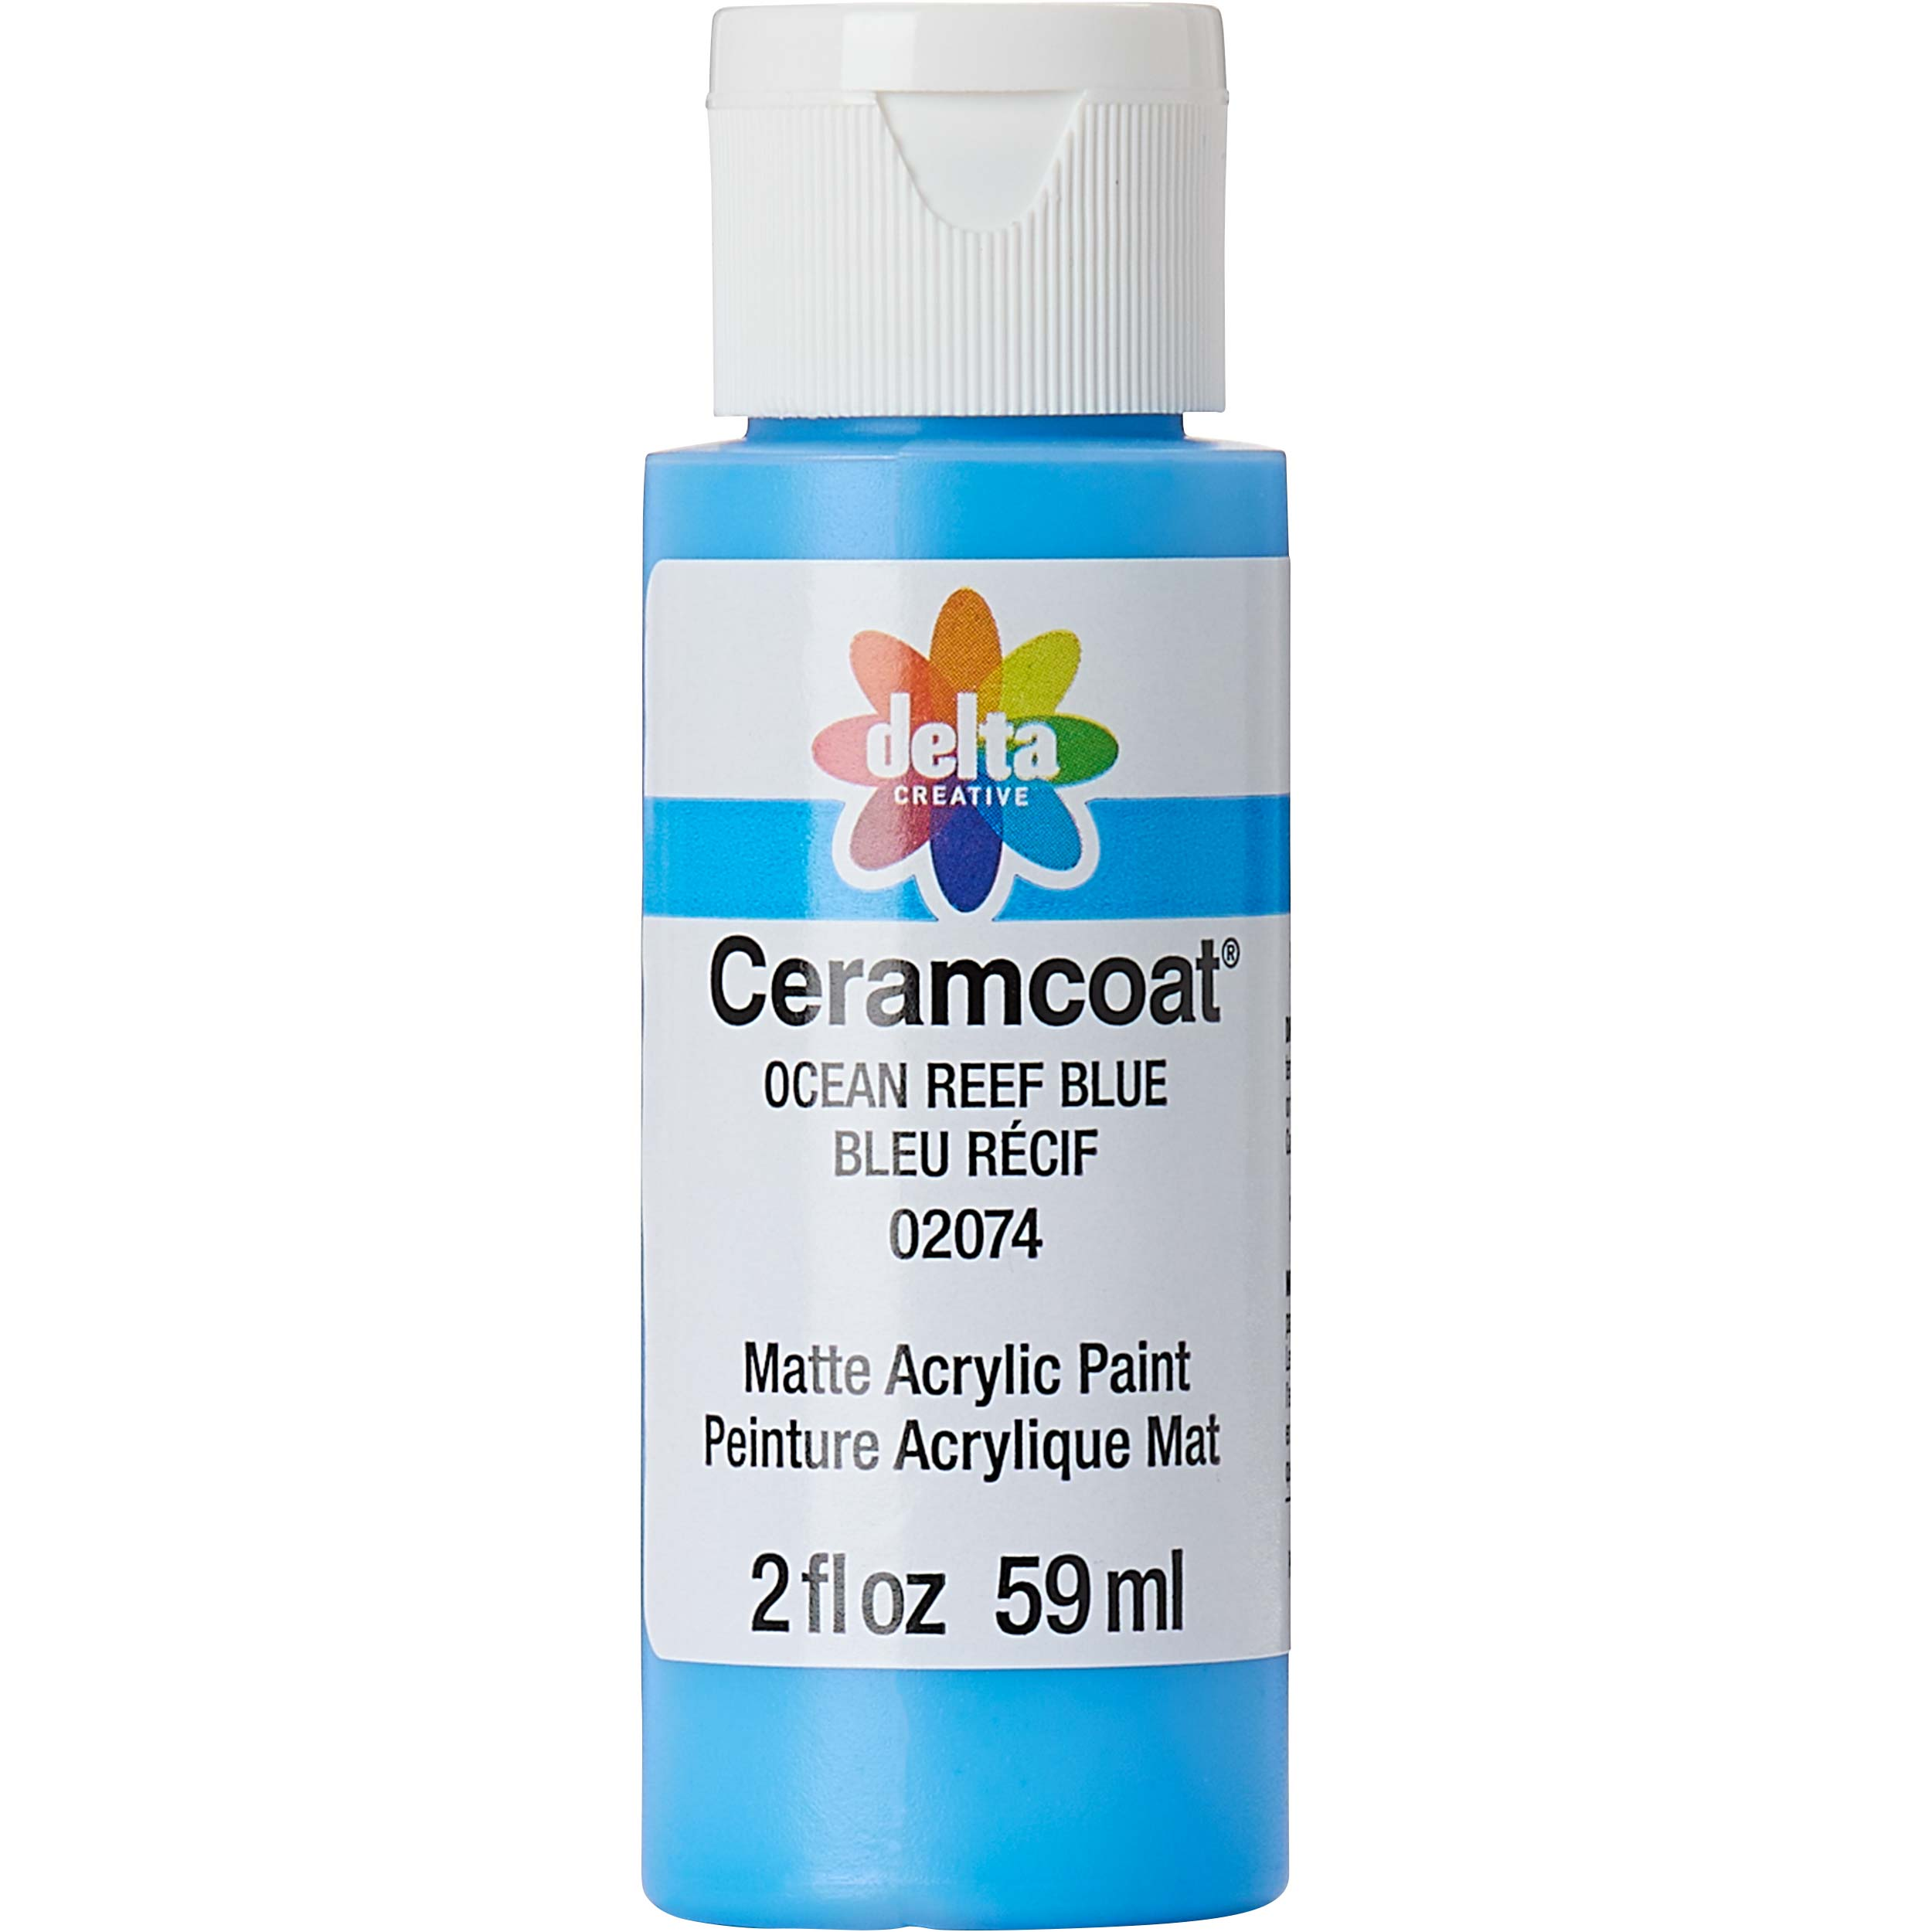 Delta Ceramcoat ® Acrylic Paint - Ocean Reef Blue, 2 oz.